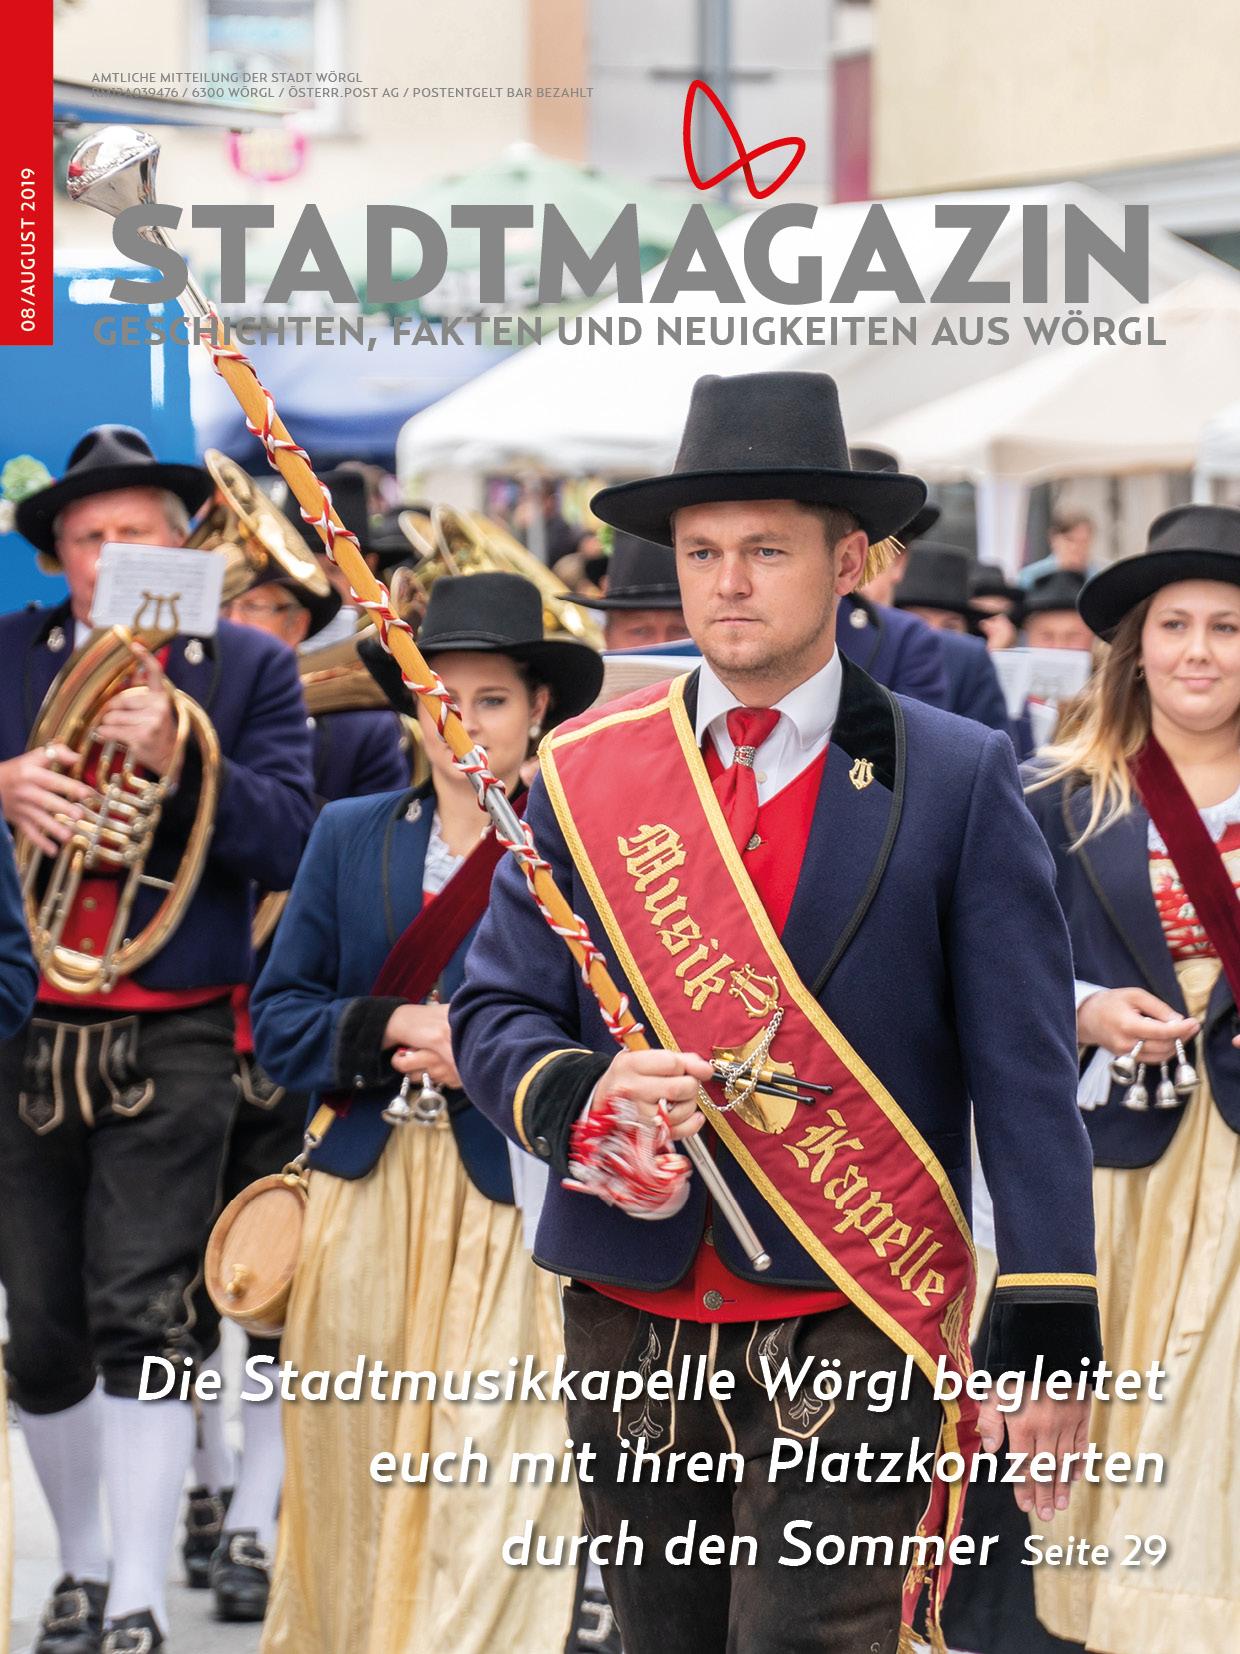 Stadtmagazin - Ausgabe 07/2019